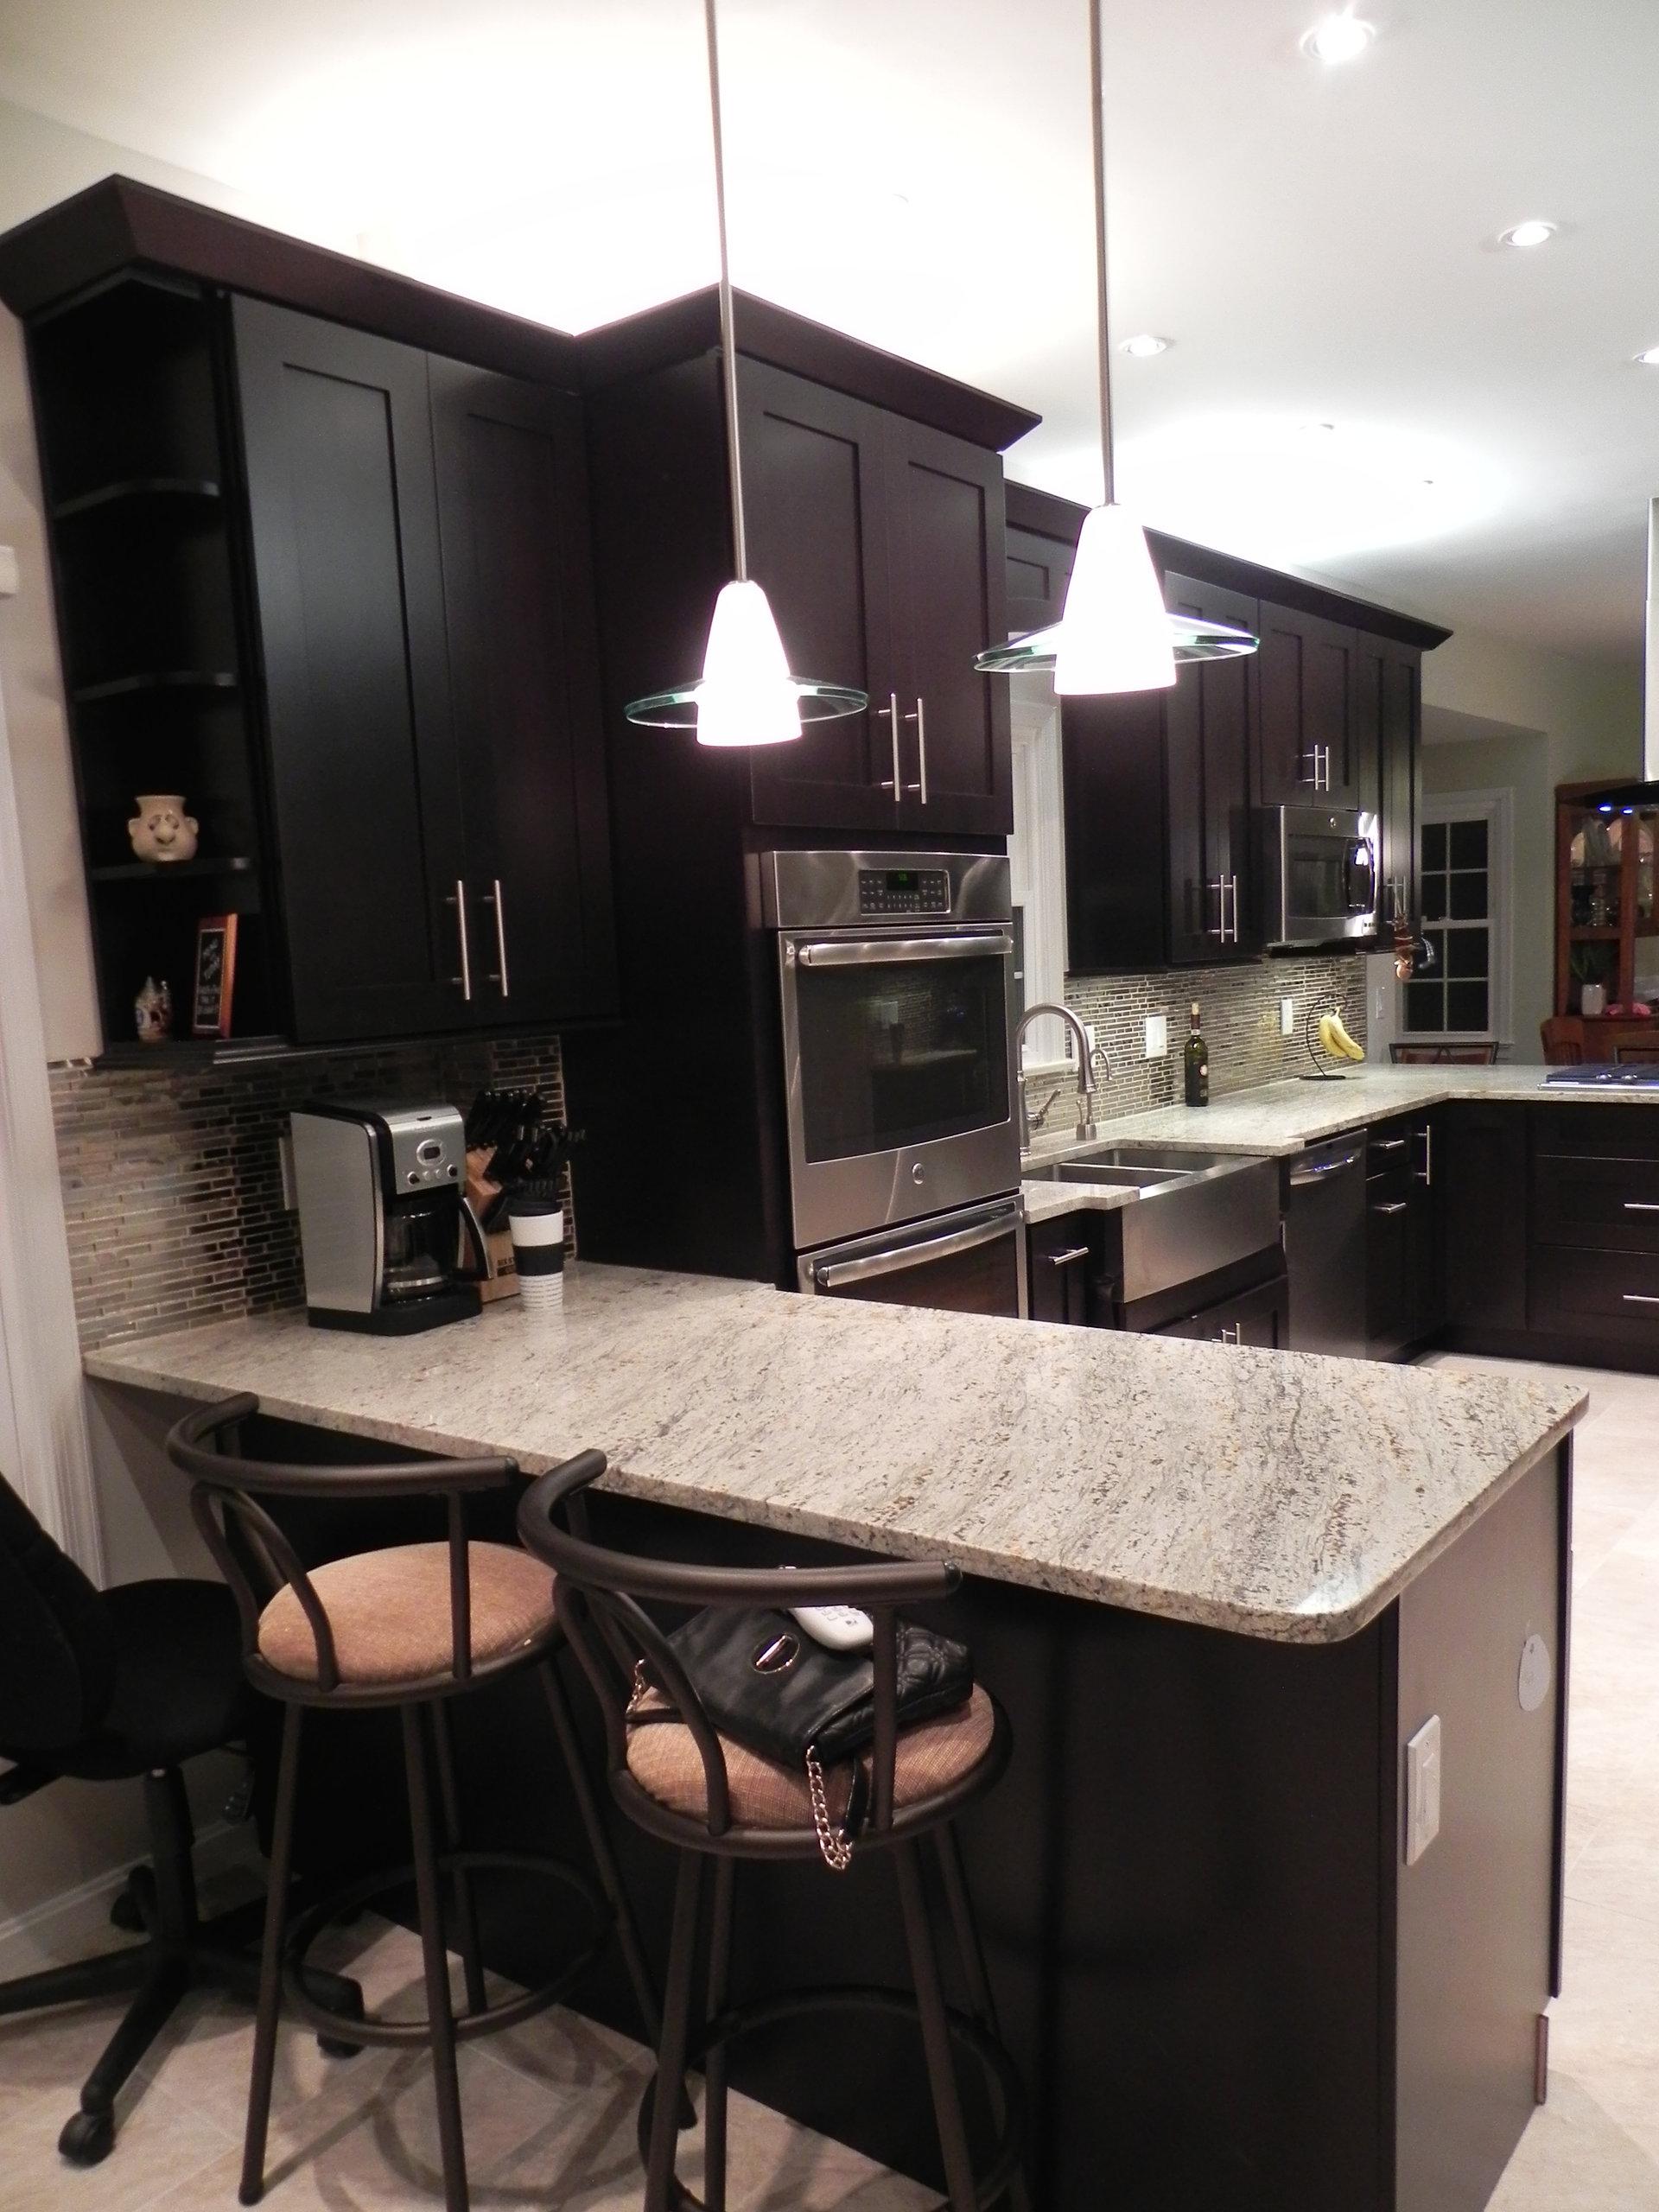 kitchen remodel in fairfax va - Kitchen Cabinets Fairfax Va